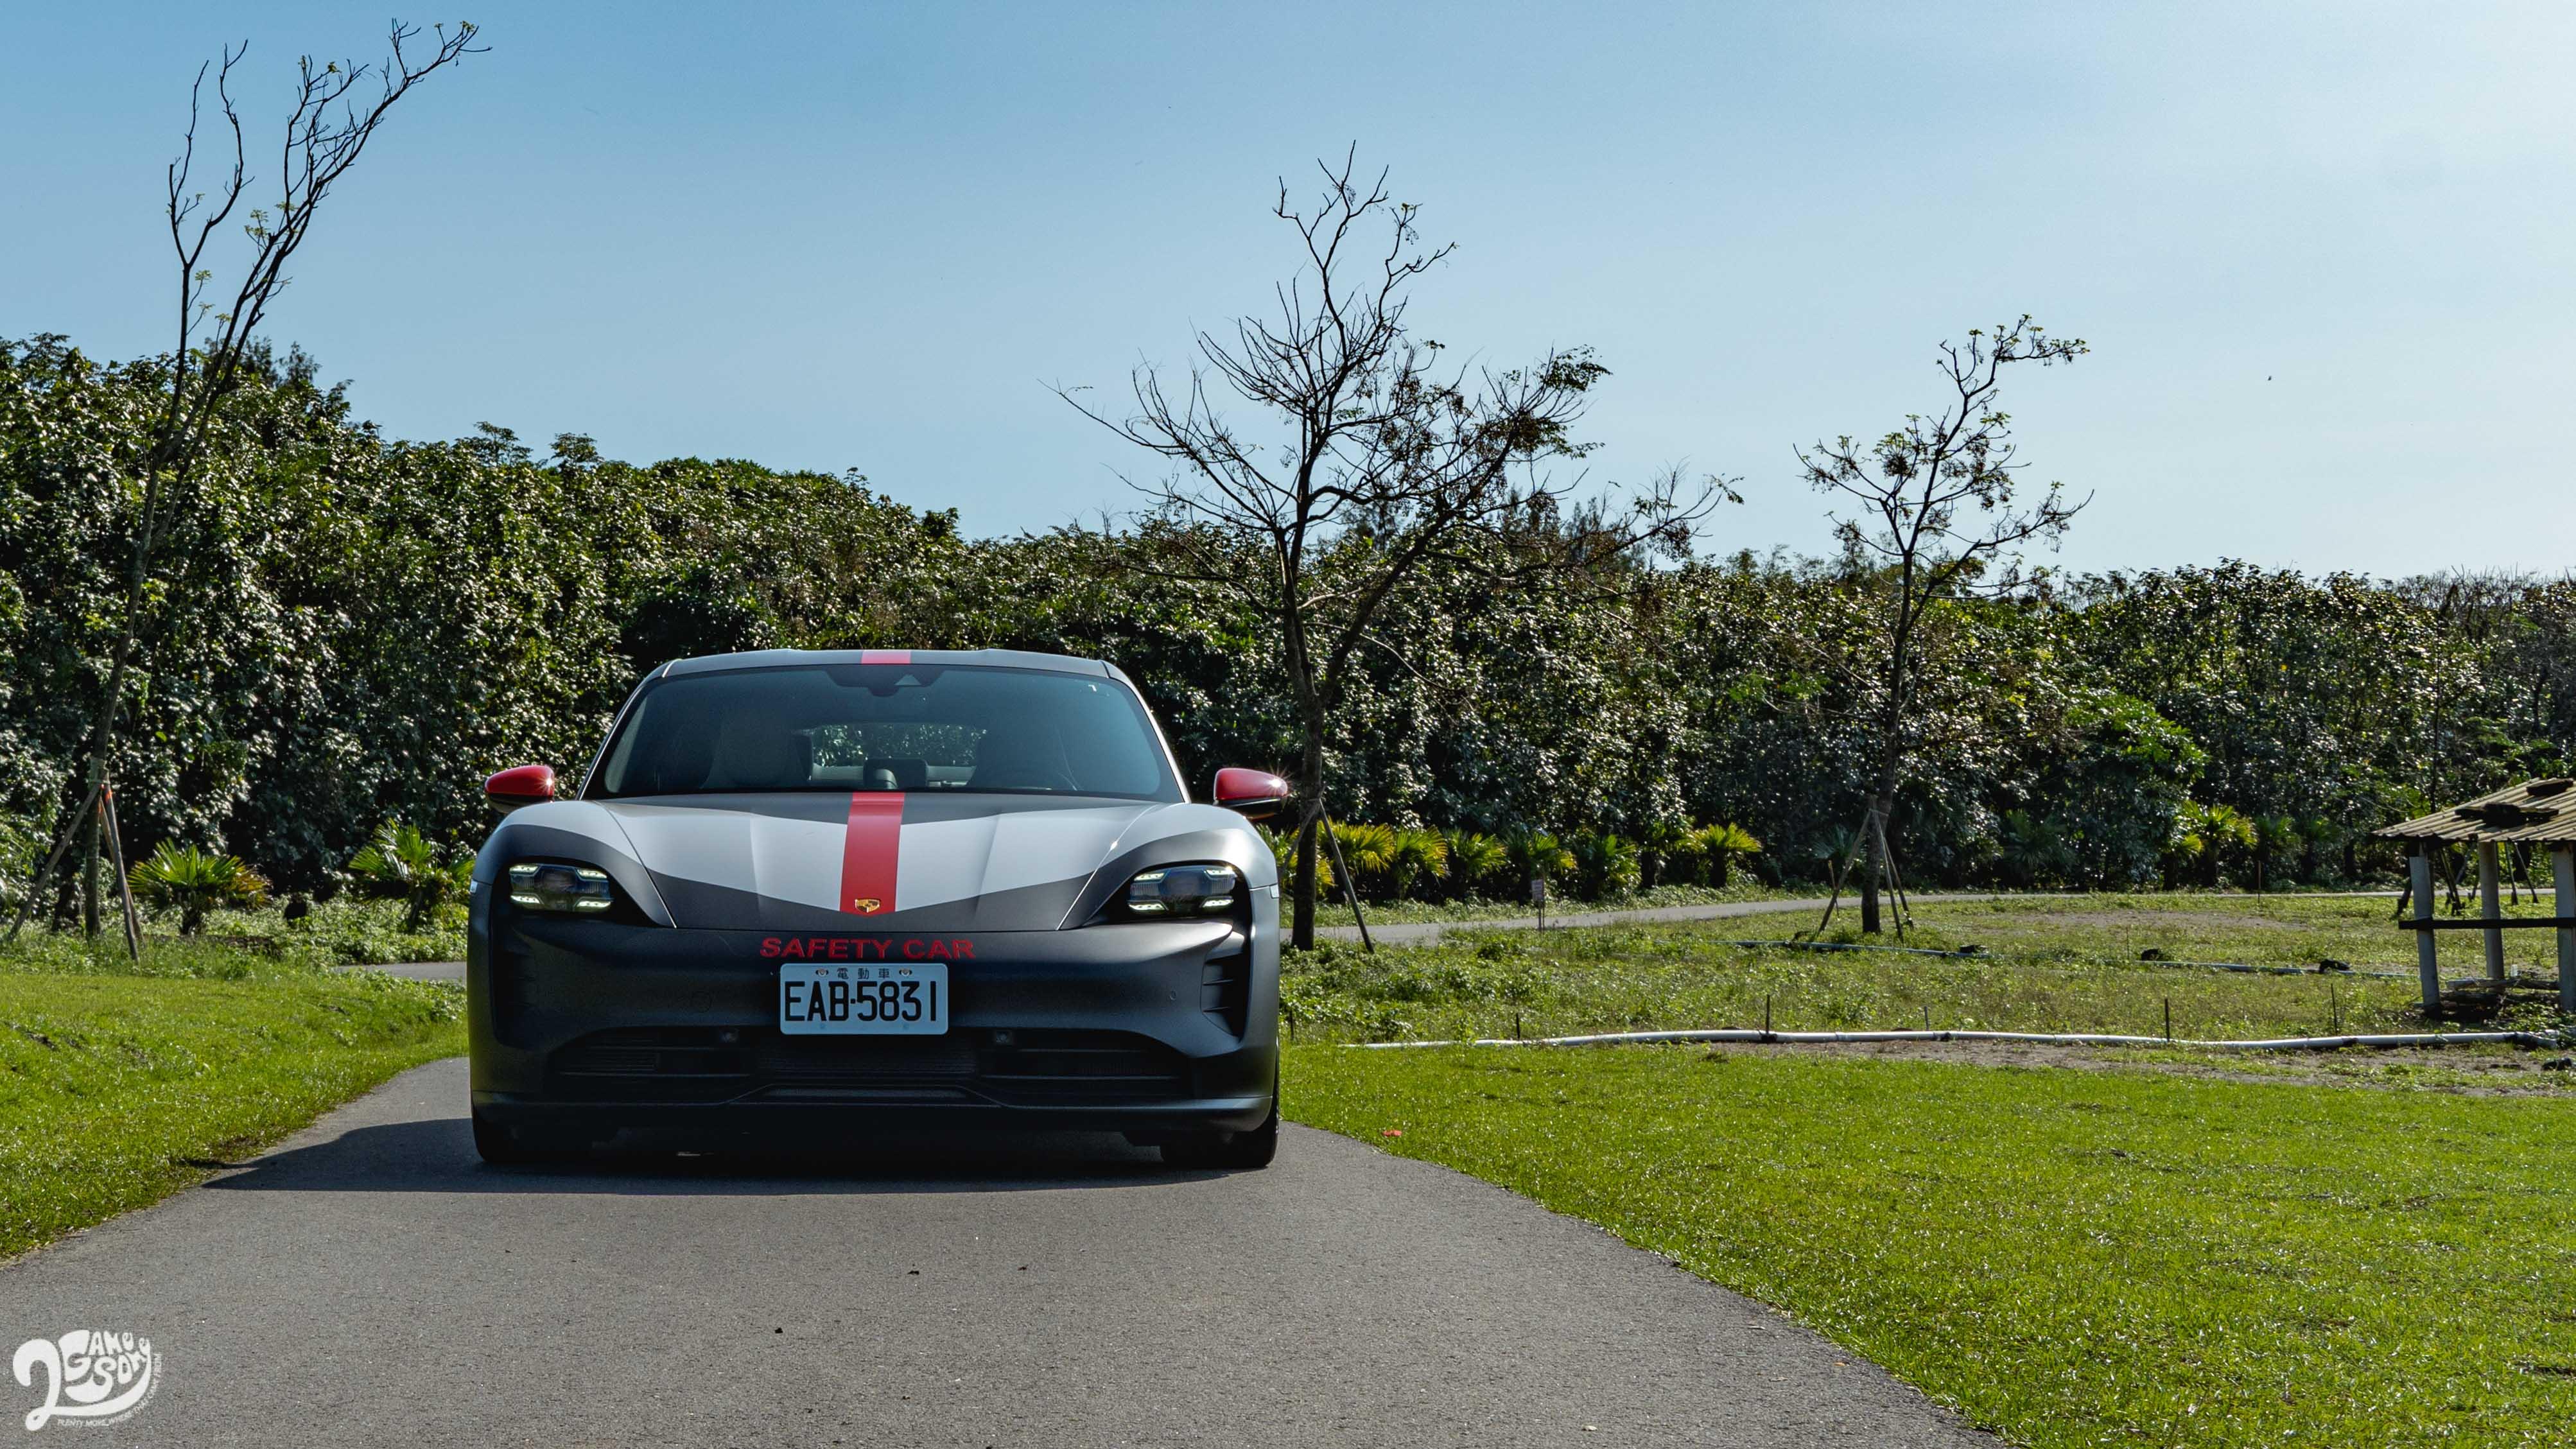 Porsche Taycan 4S 起價 473 萬元。另有 660 萬起的 Taycan Turbo 以及 800 萬起的 Turbo S。